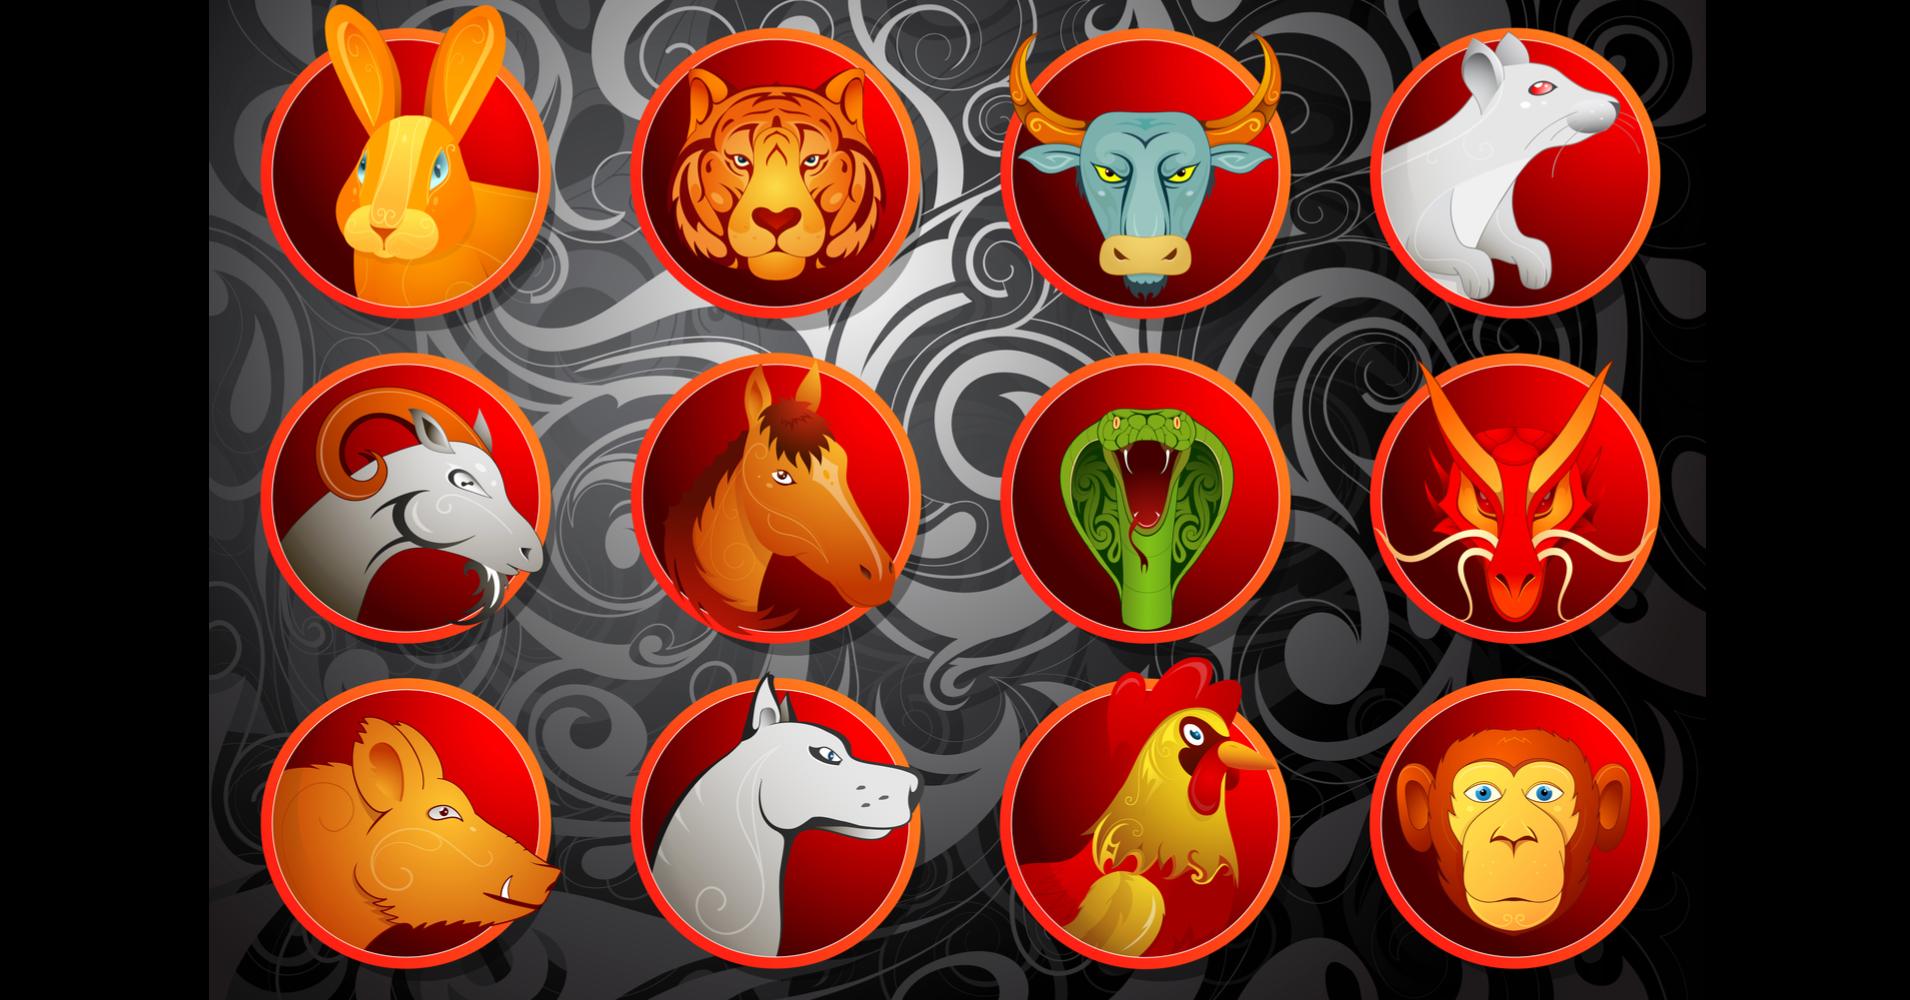 What Chinese Zodiac Sign Am I? - Quiz - Quizony com